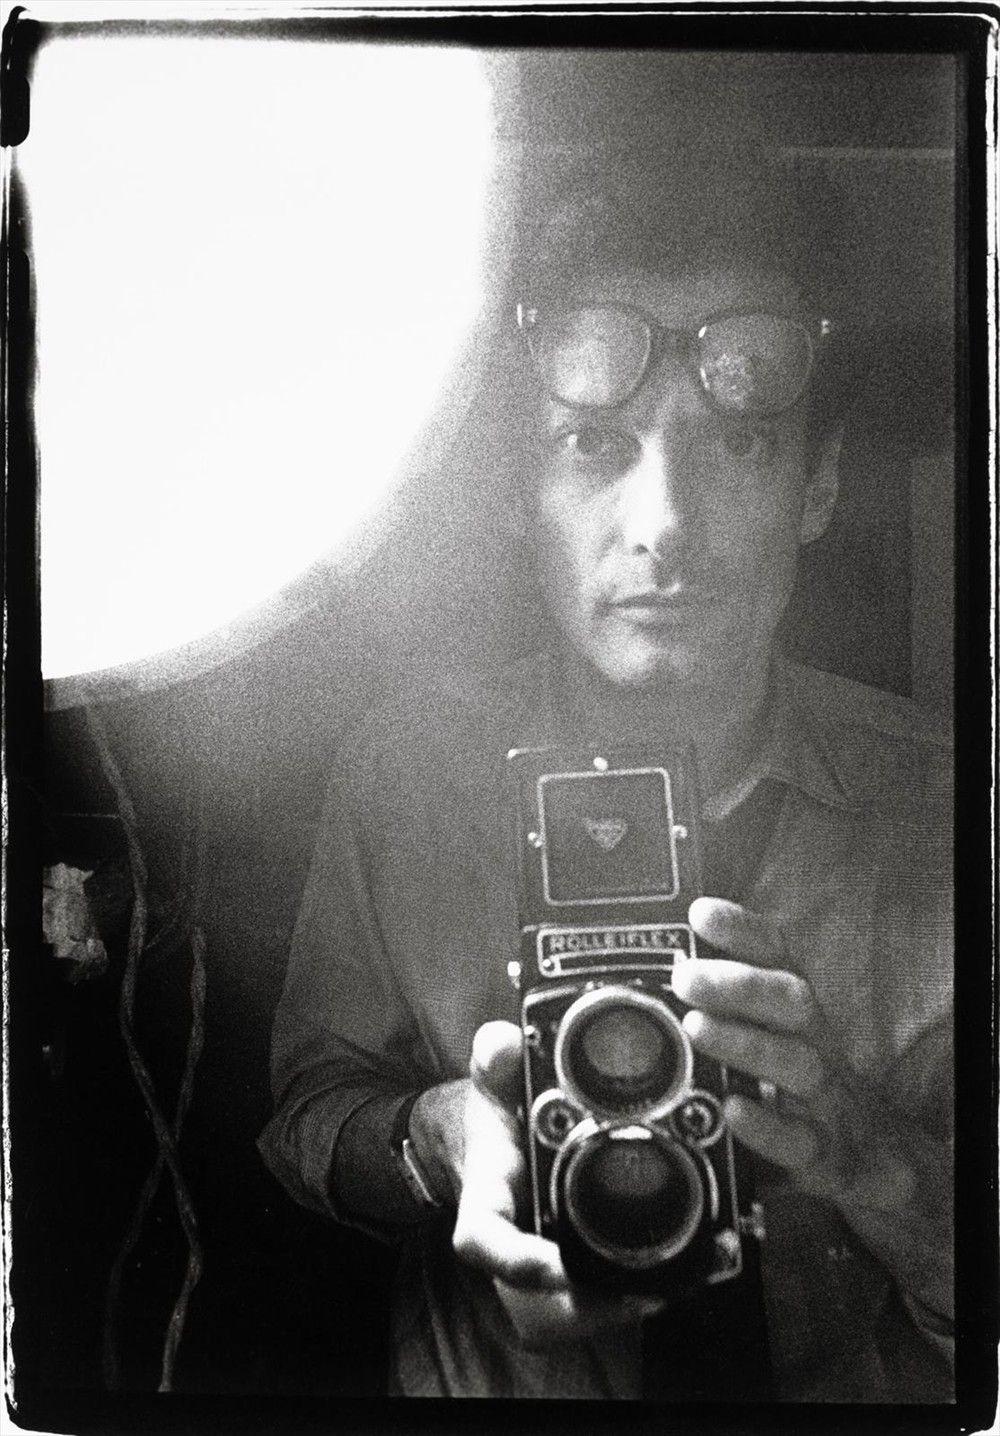 Richard Avedon, Self Portrait, c.1963